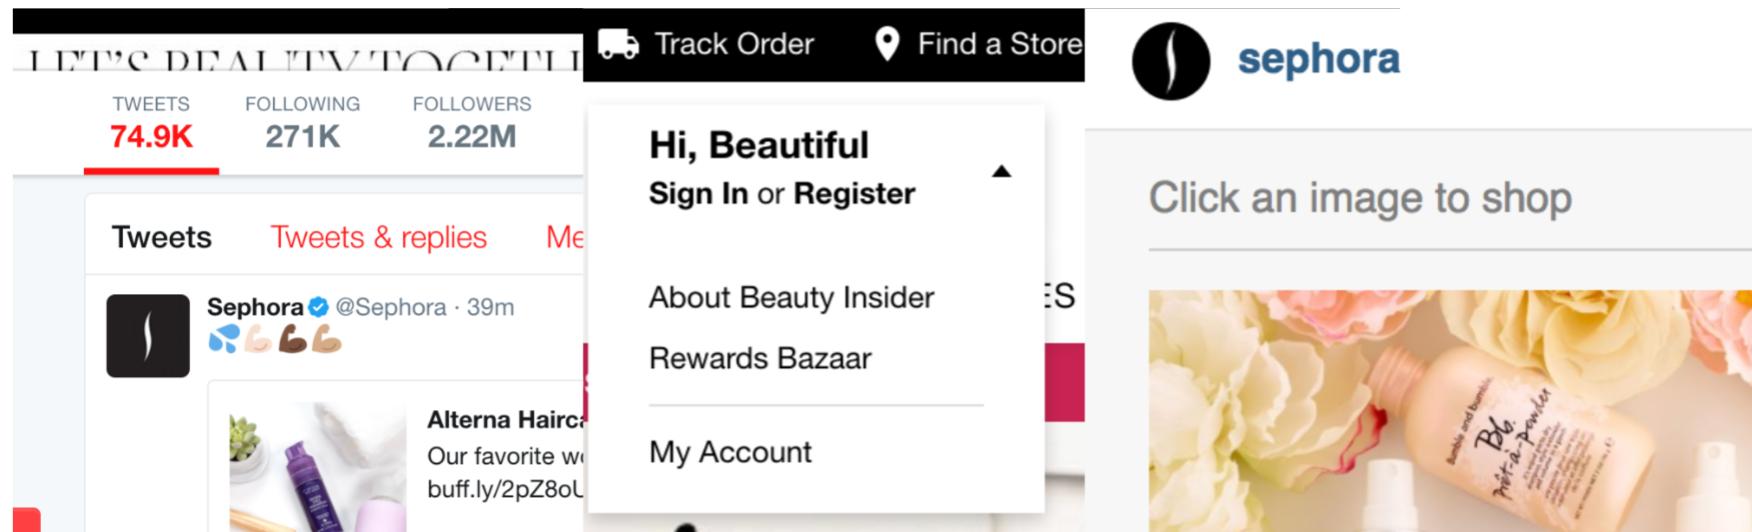 Sephora のソーシャルメディアのフォロー画面